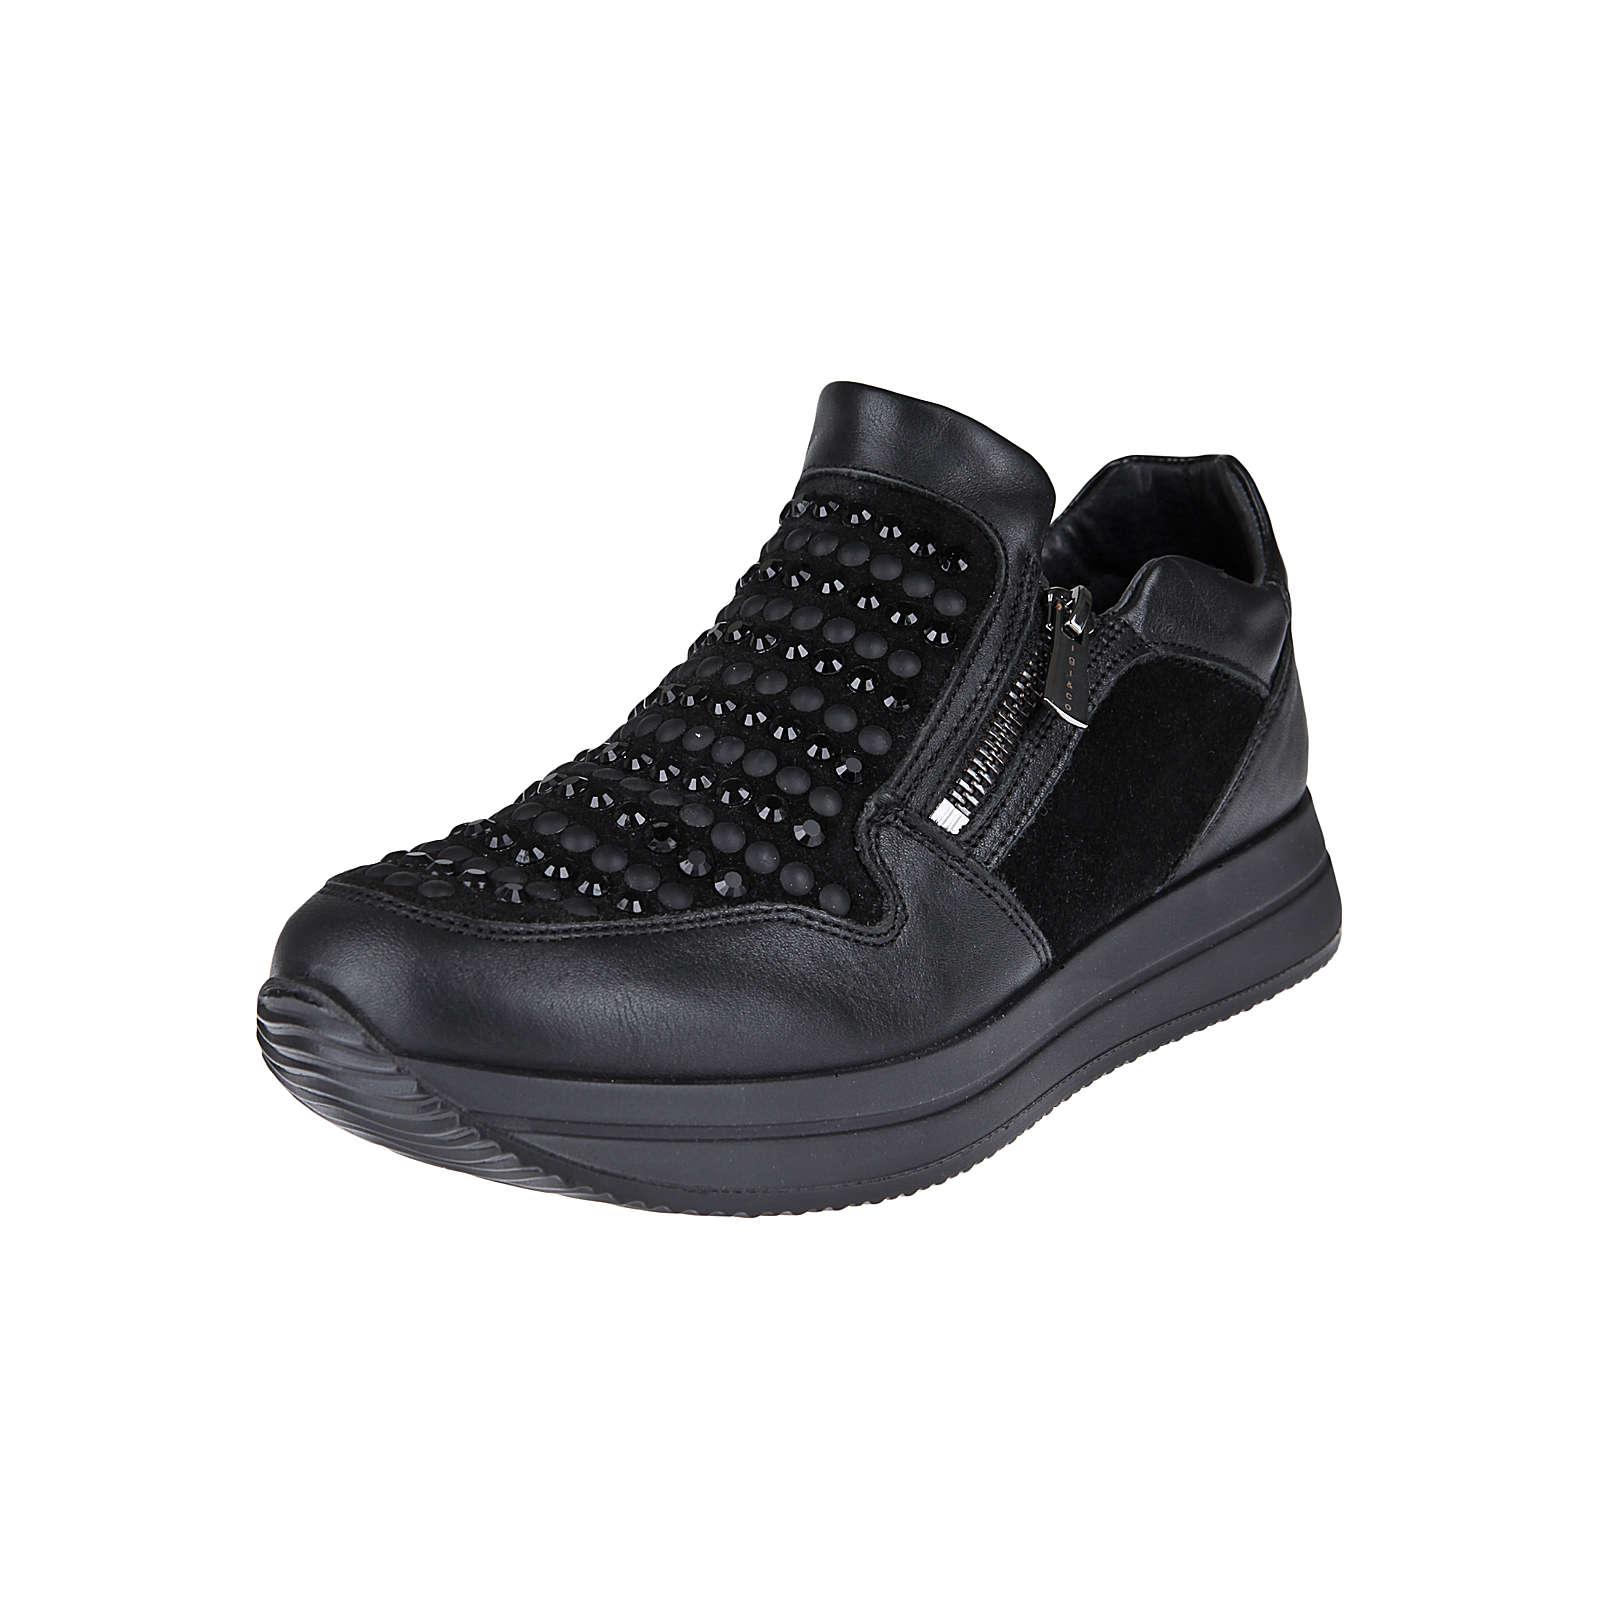 IGI & CO Slip-On Sneaker mit Strass Sneakers Low dunkelbraun Damen Gr. 37